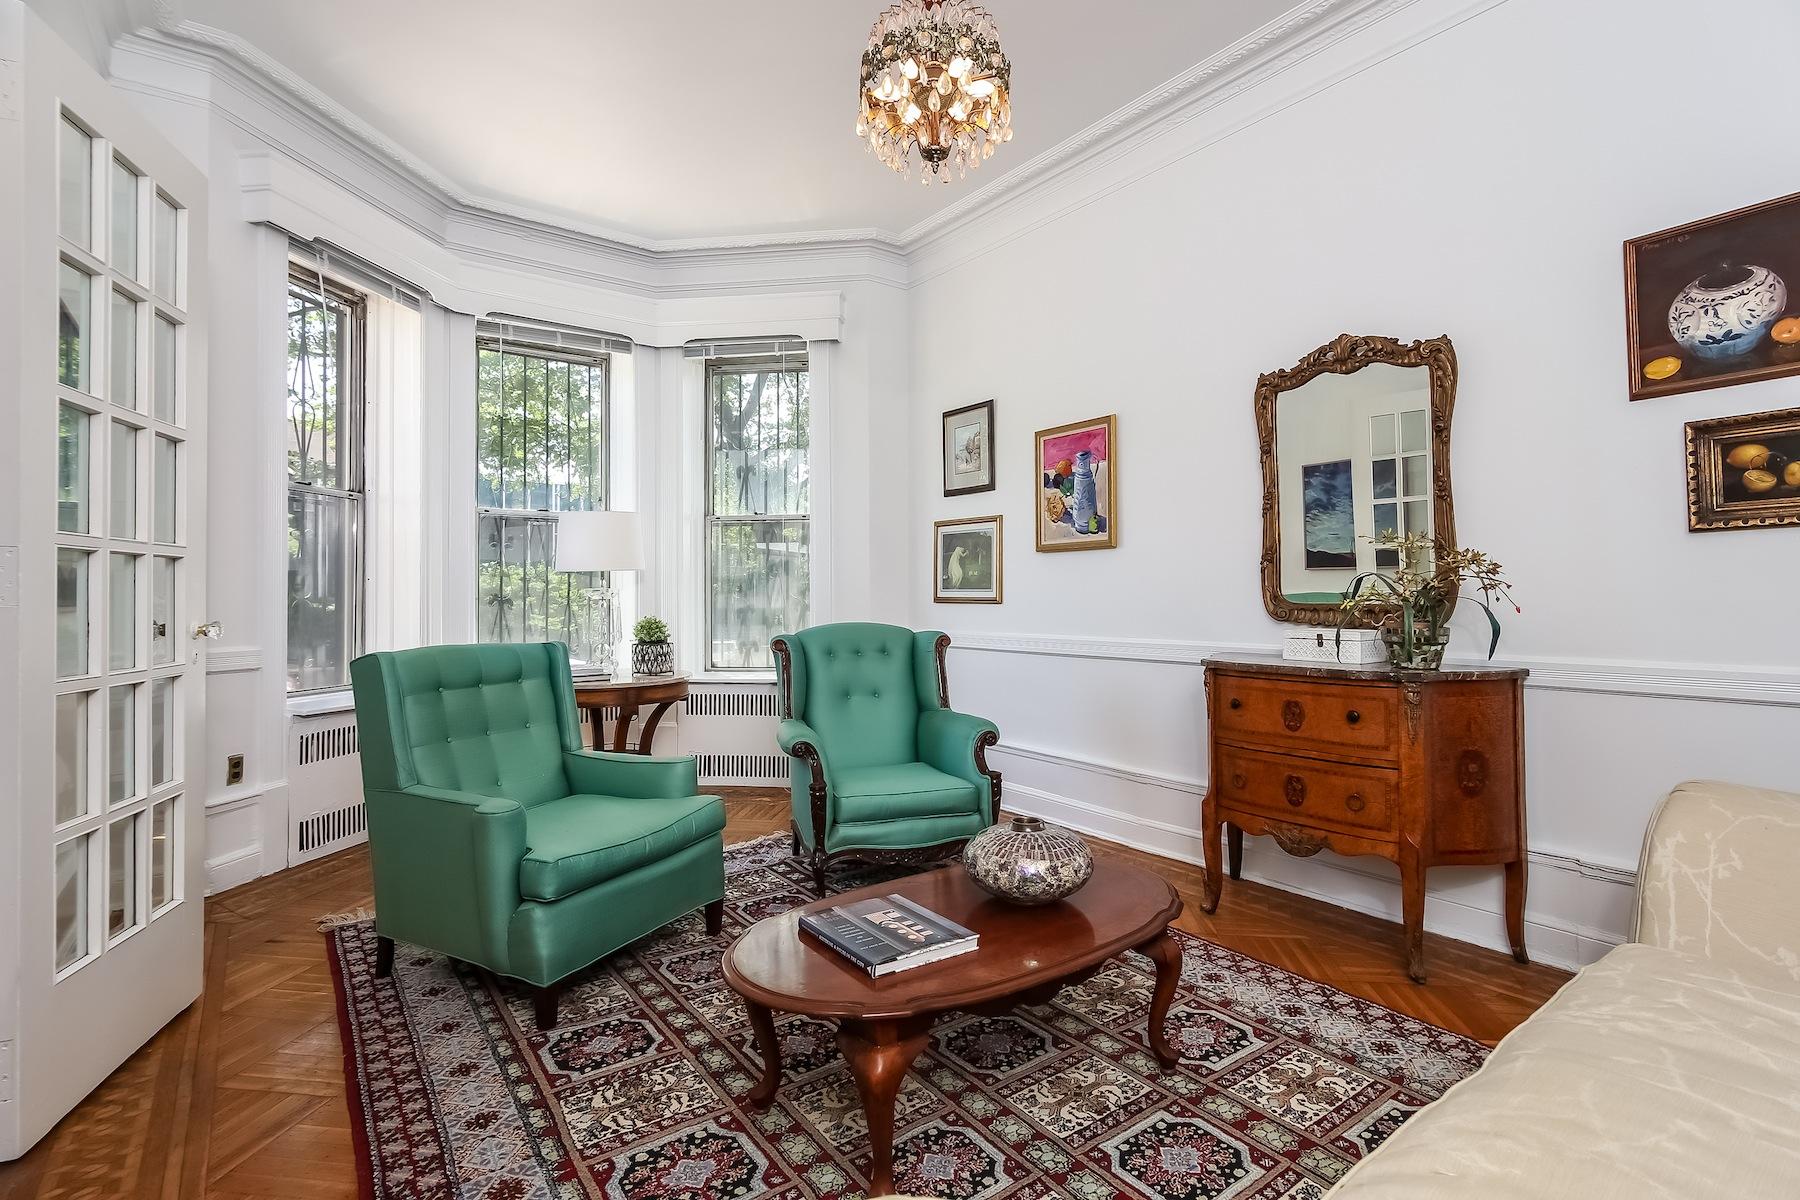 Additional photo for property listing at 901 Saint Marks Avenue  布鲁克林, 纽约州 11213 美国